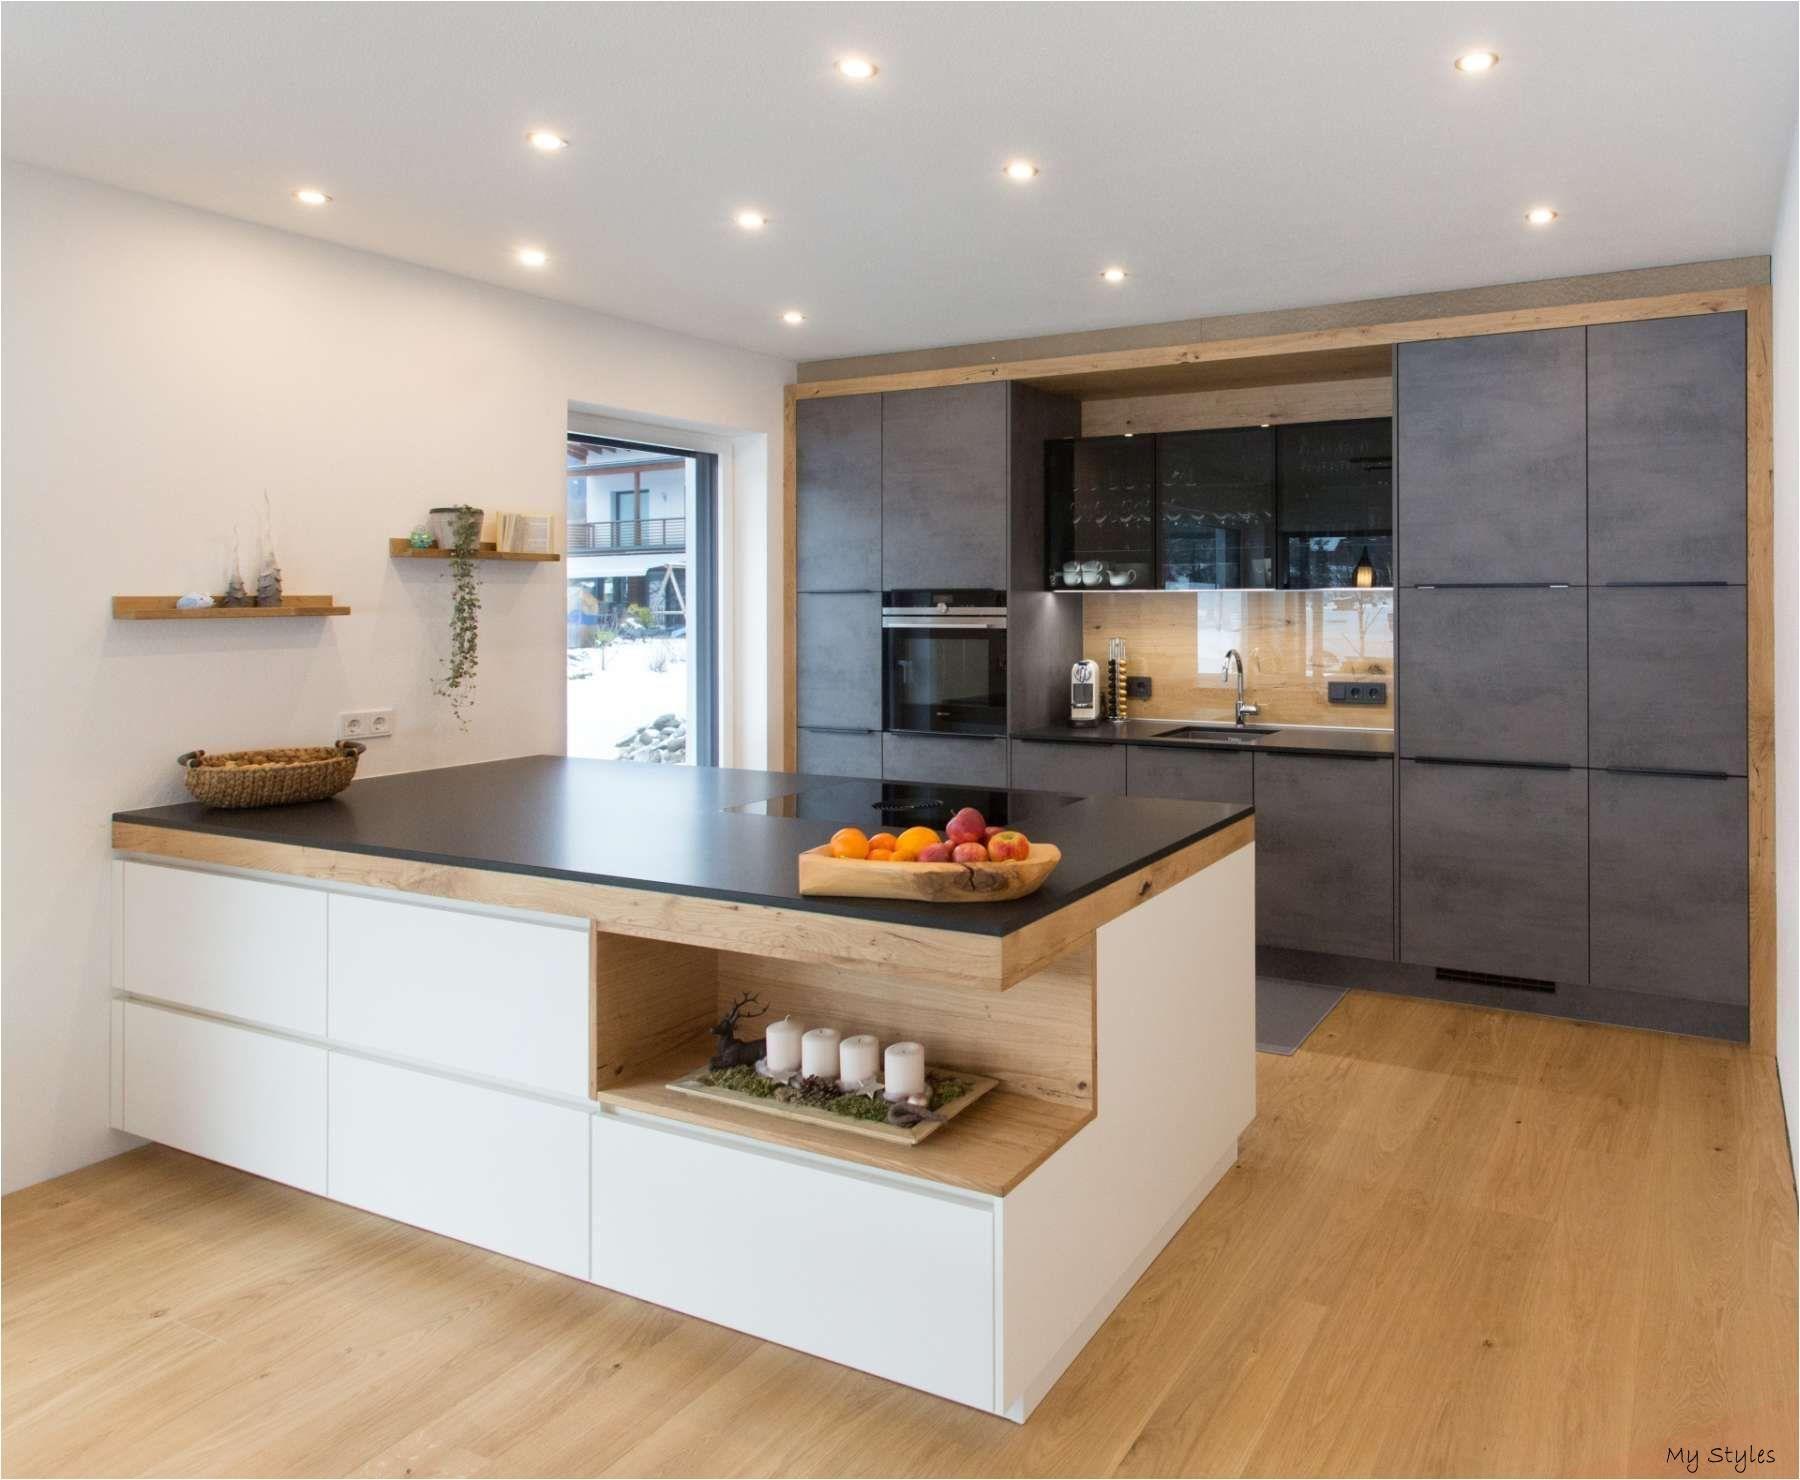 Wandgestaltung Küche Pinterest